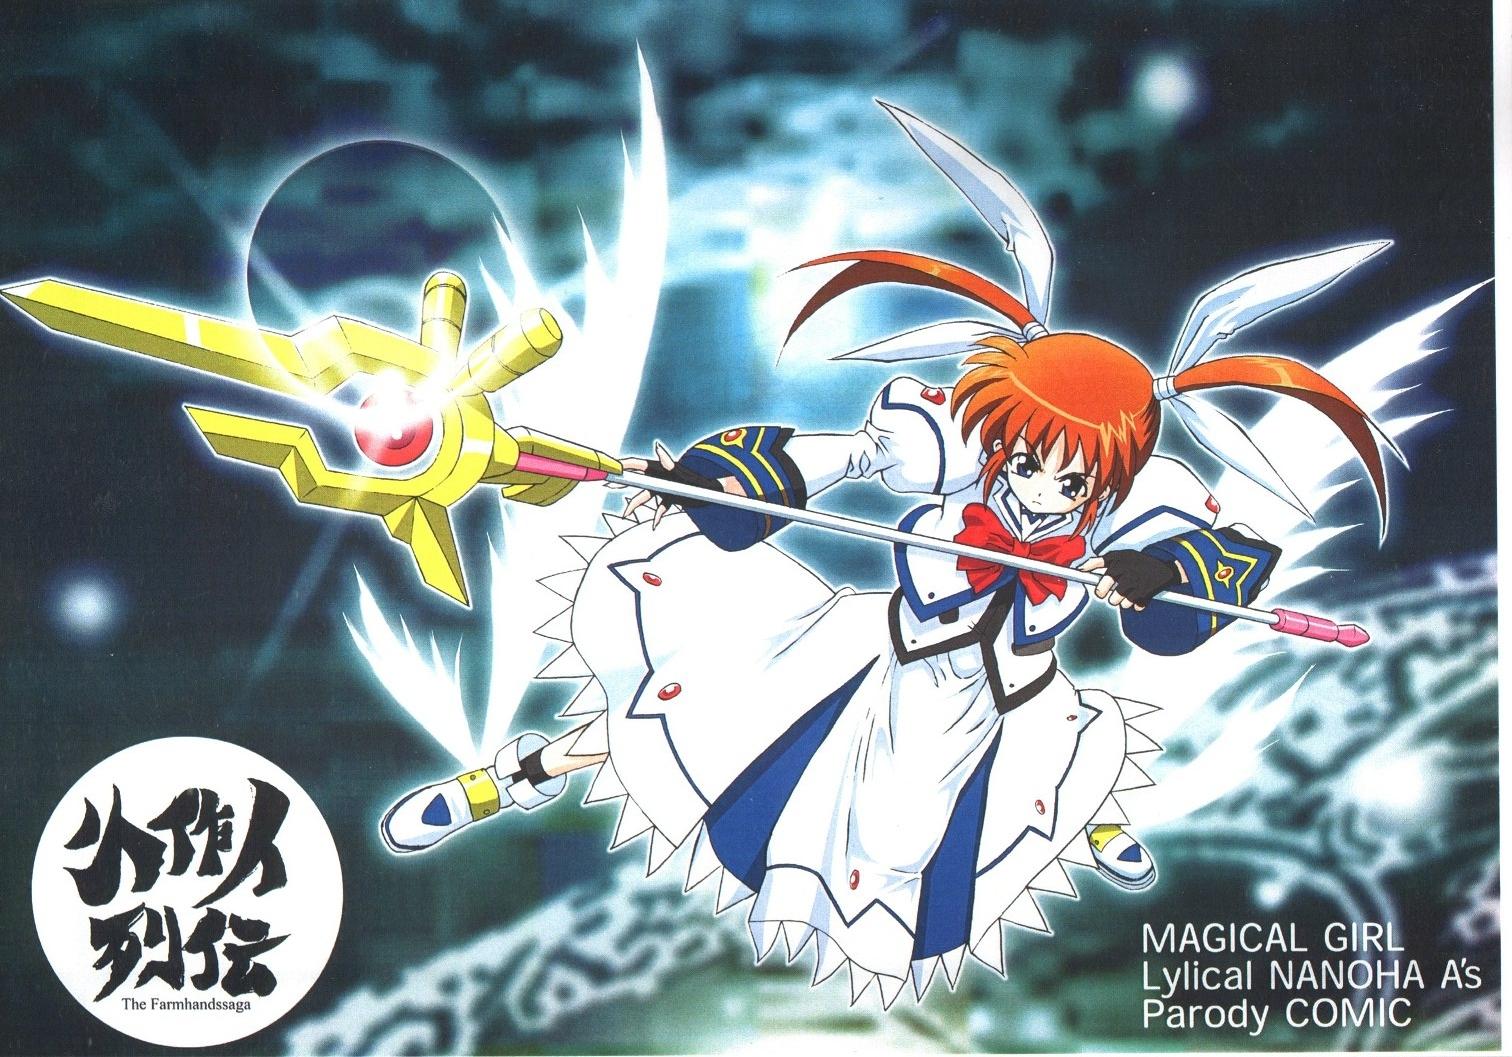 http://anime.com.ru/modules/coppermine/albums_for_animecomru_users/users/42753/32753_1230064892.jpg